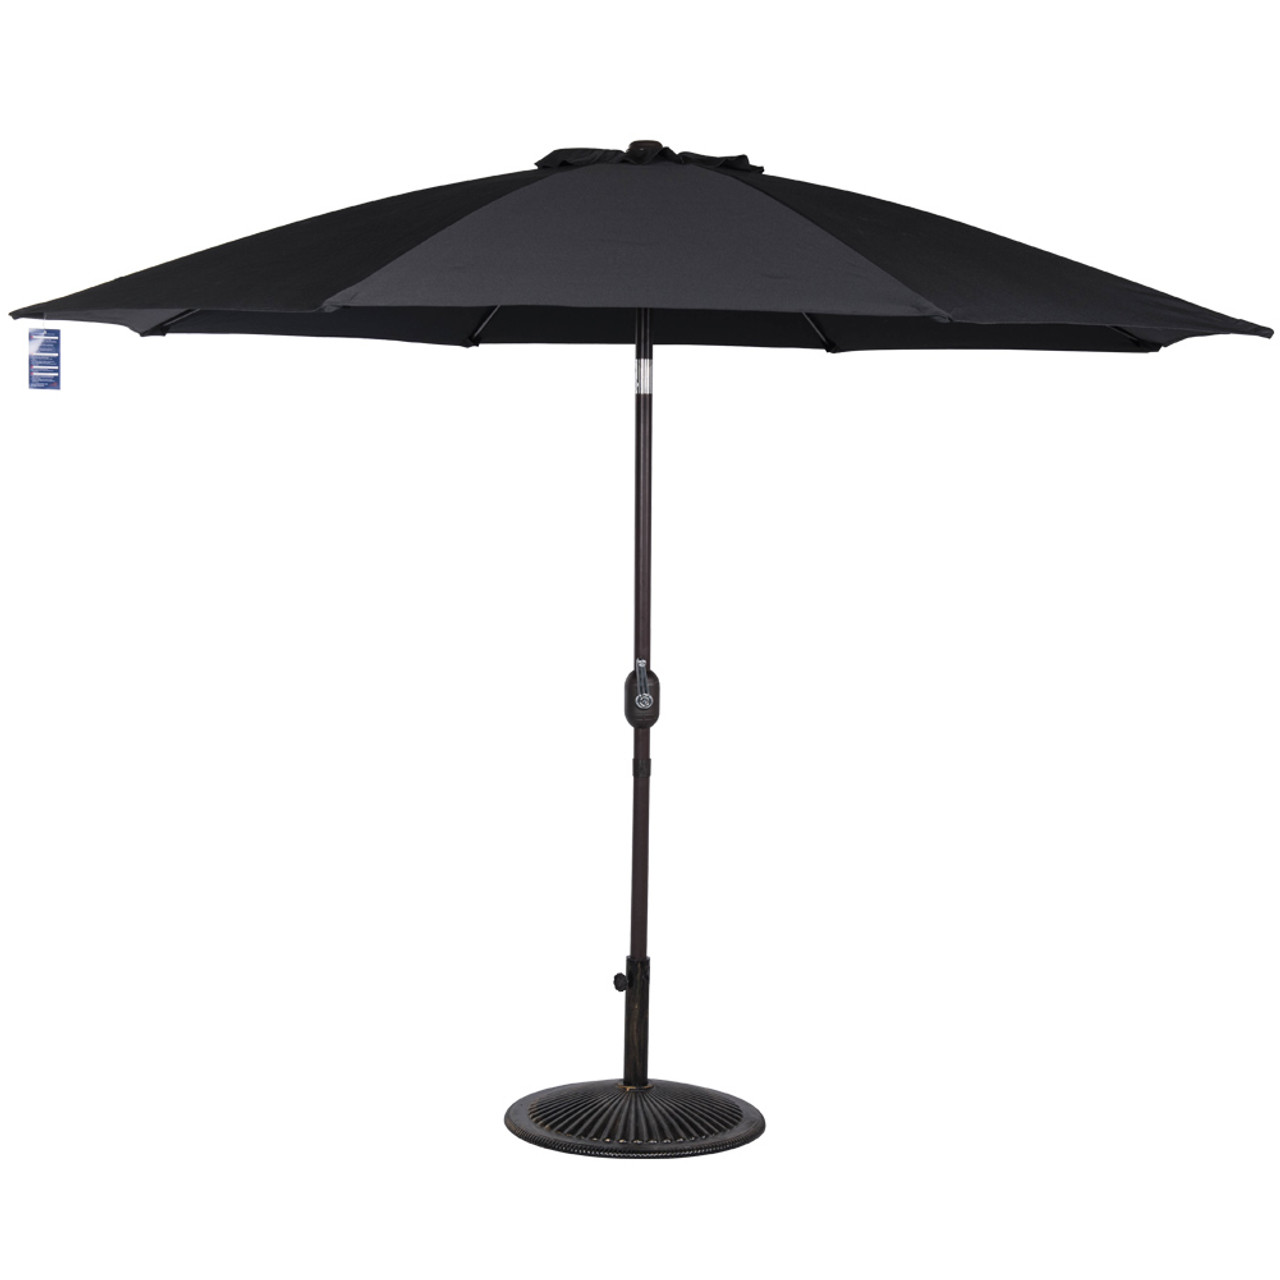 9 Feet Aluminum Patio Umbrella With Crank And Push Button Tilt(Black)